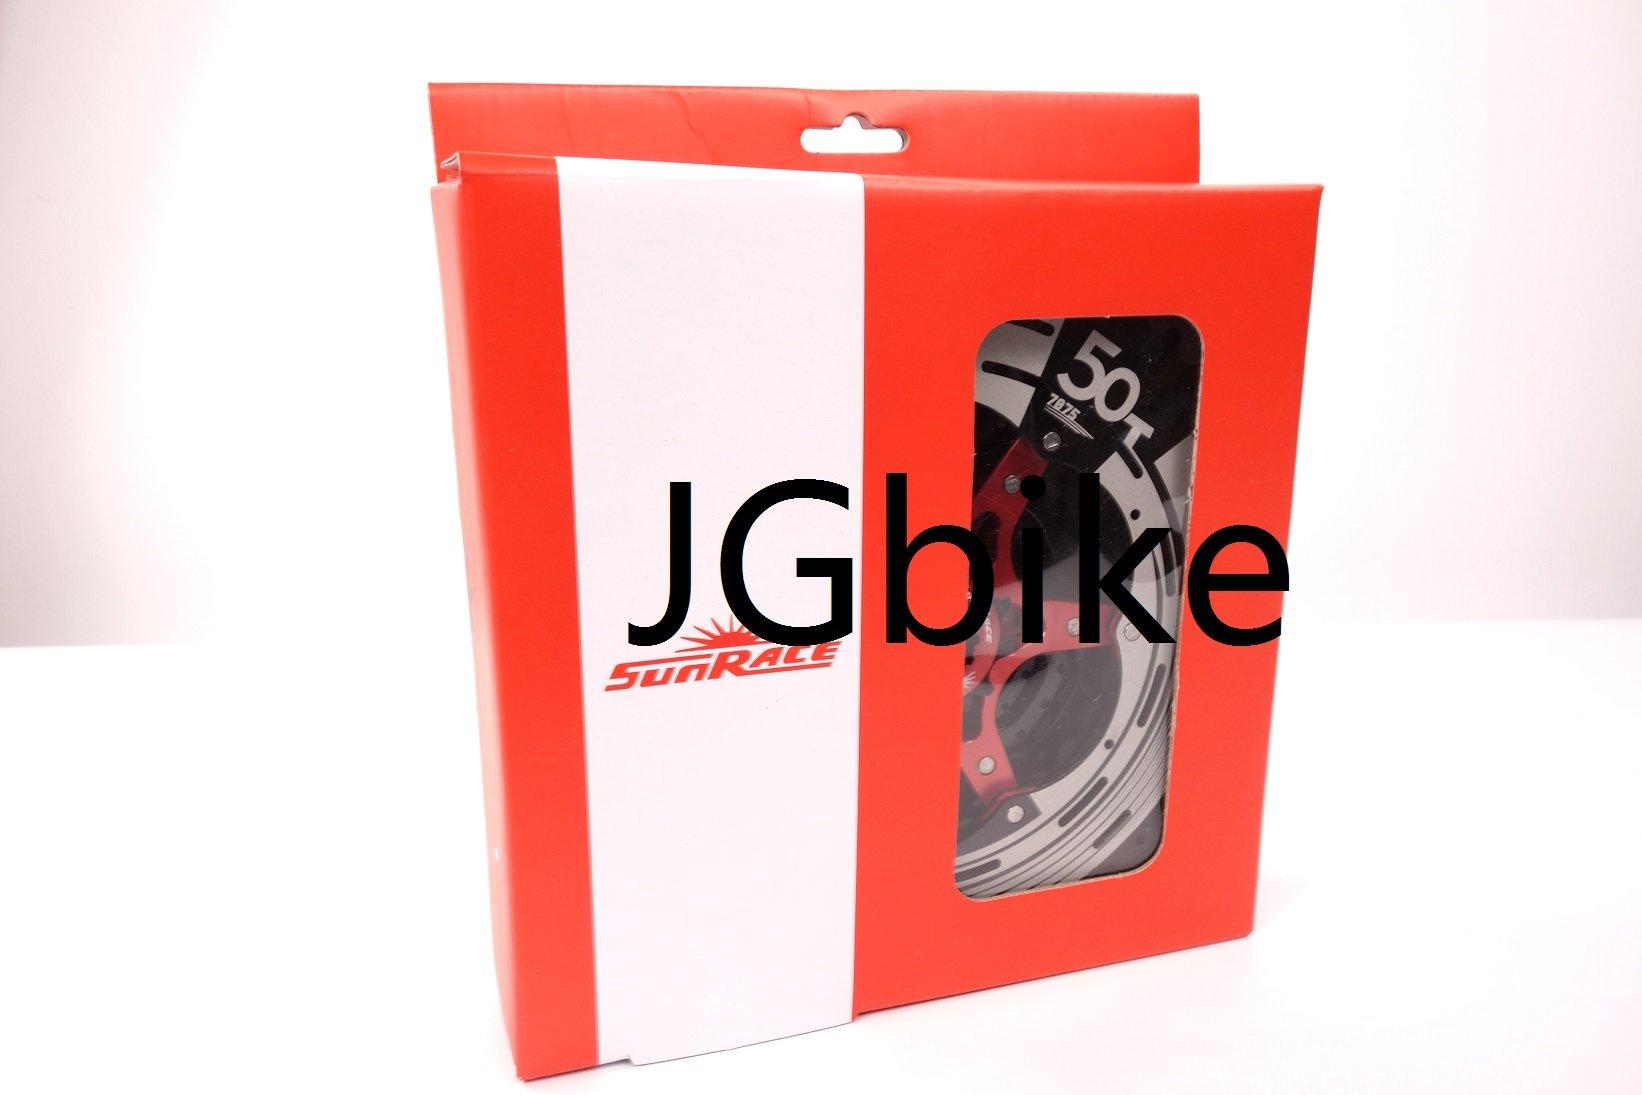 Sunrace 11-speed 11-50T CSMX80 wide ratio MTB Cassette freewheel with rear derailleur extender by JGbike (Black Chrome) by JGbike (Image #6)